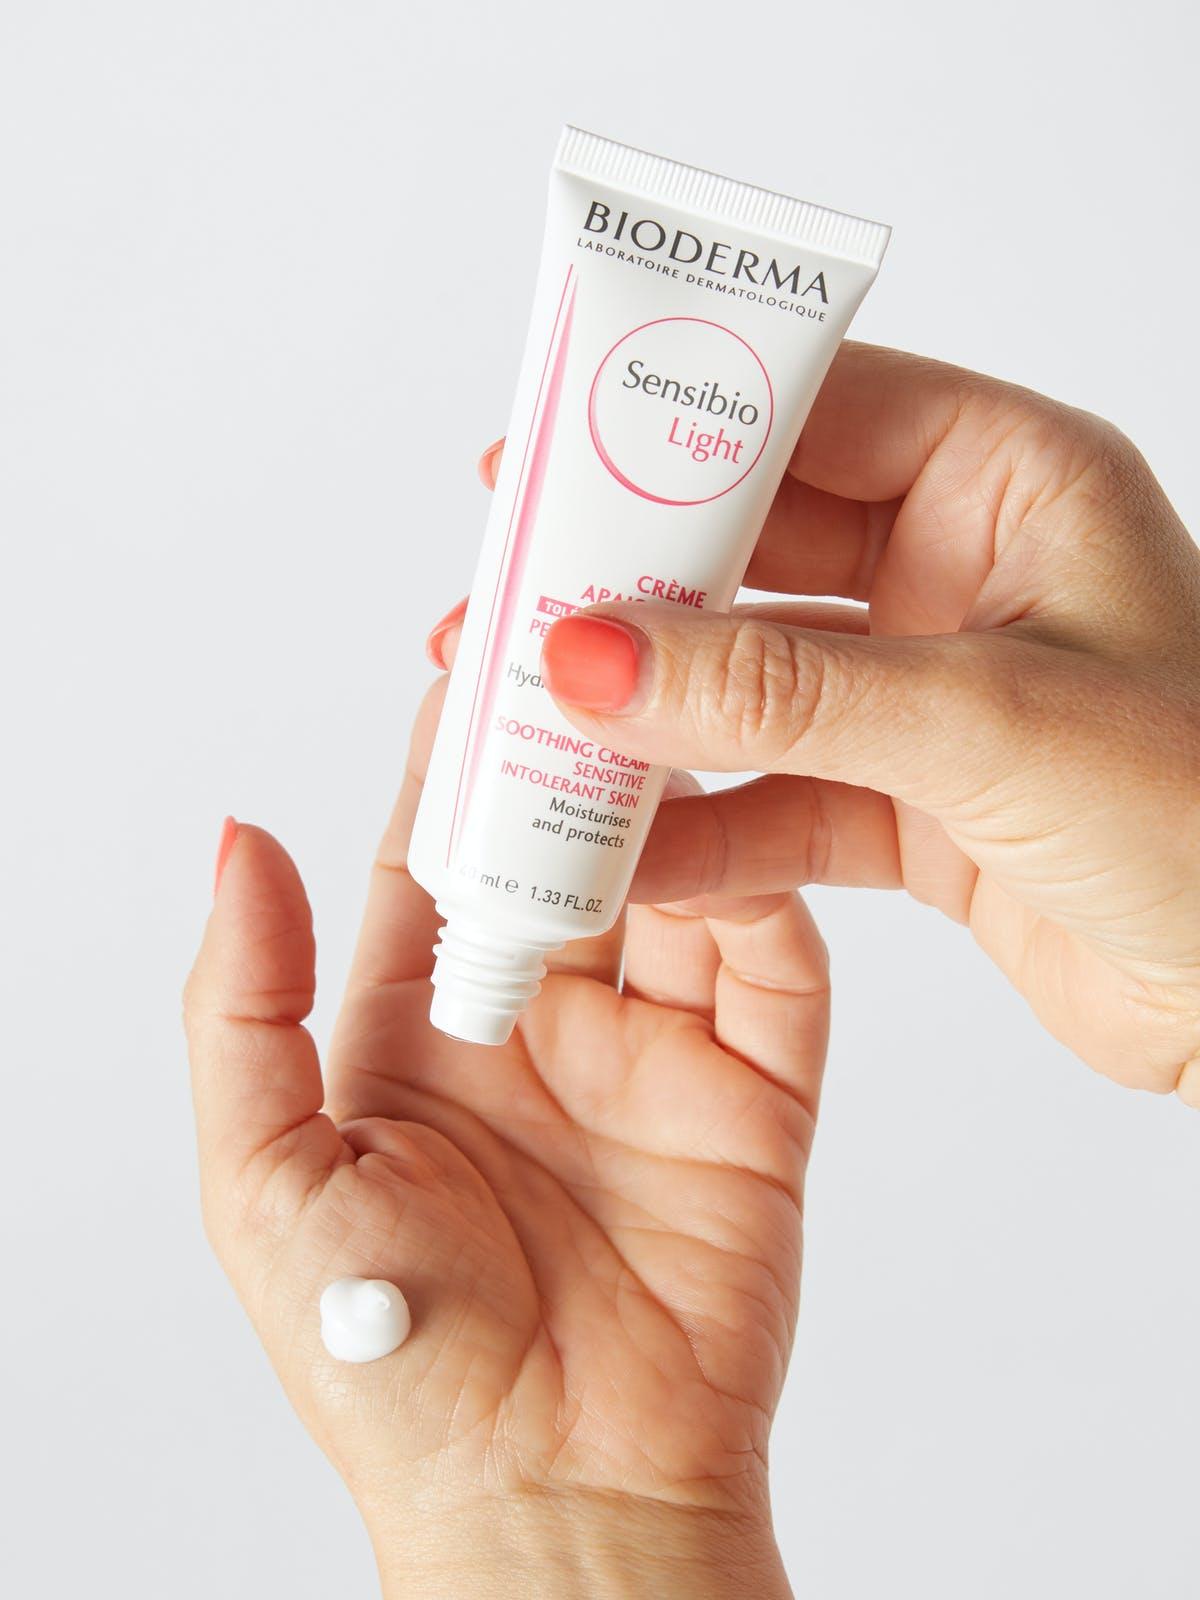 Bioderma Sensibio Light Cream   Verishop